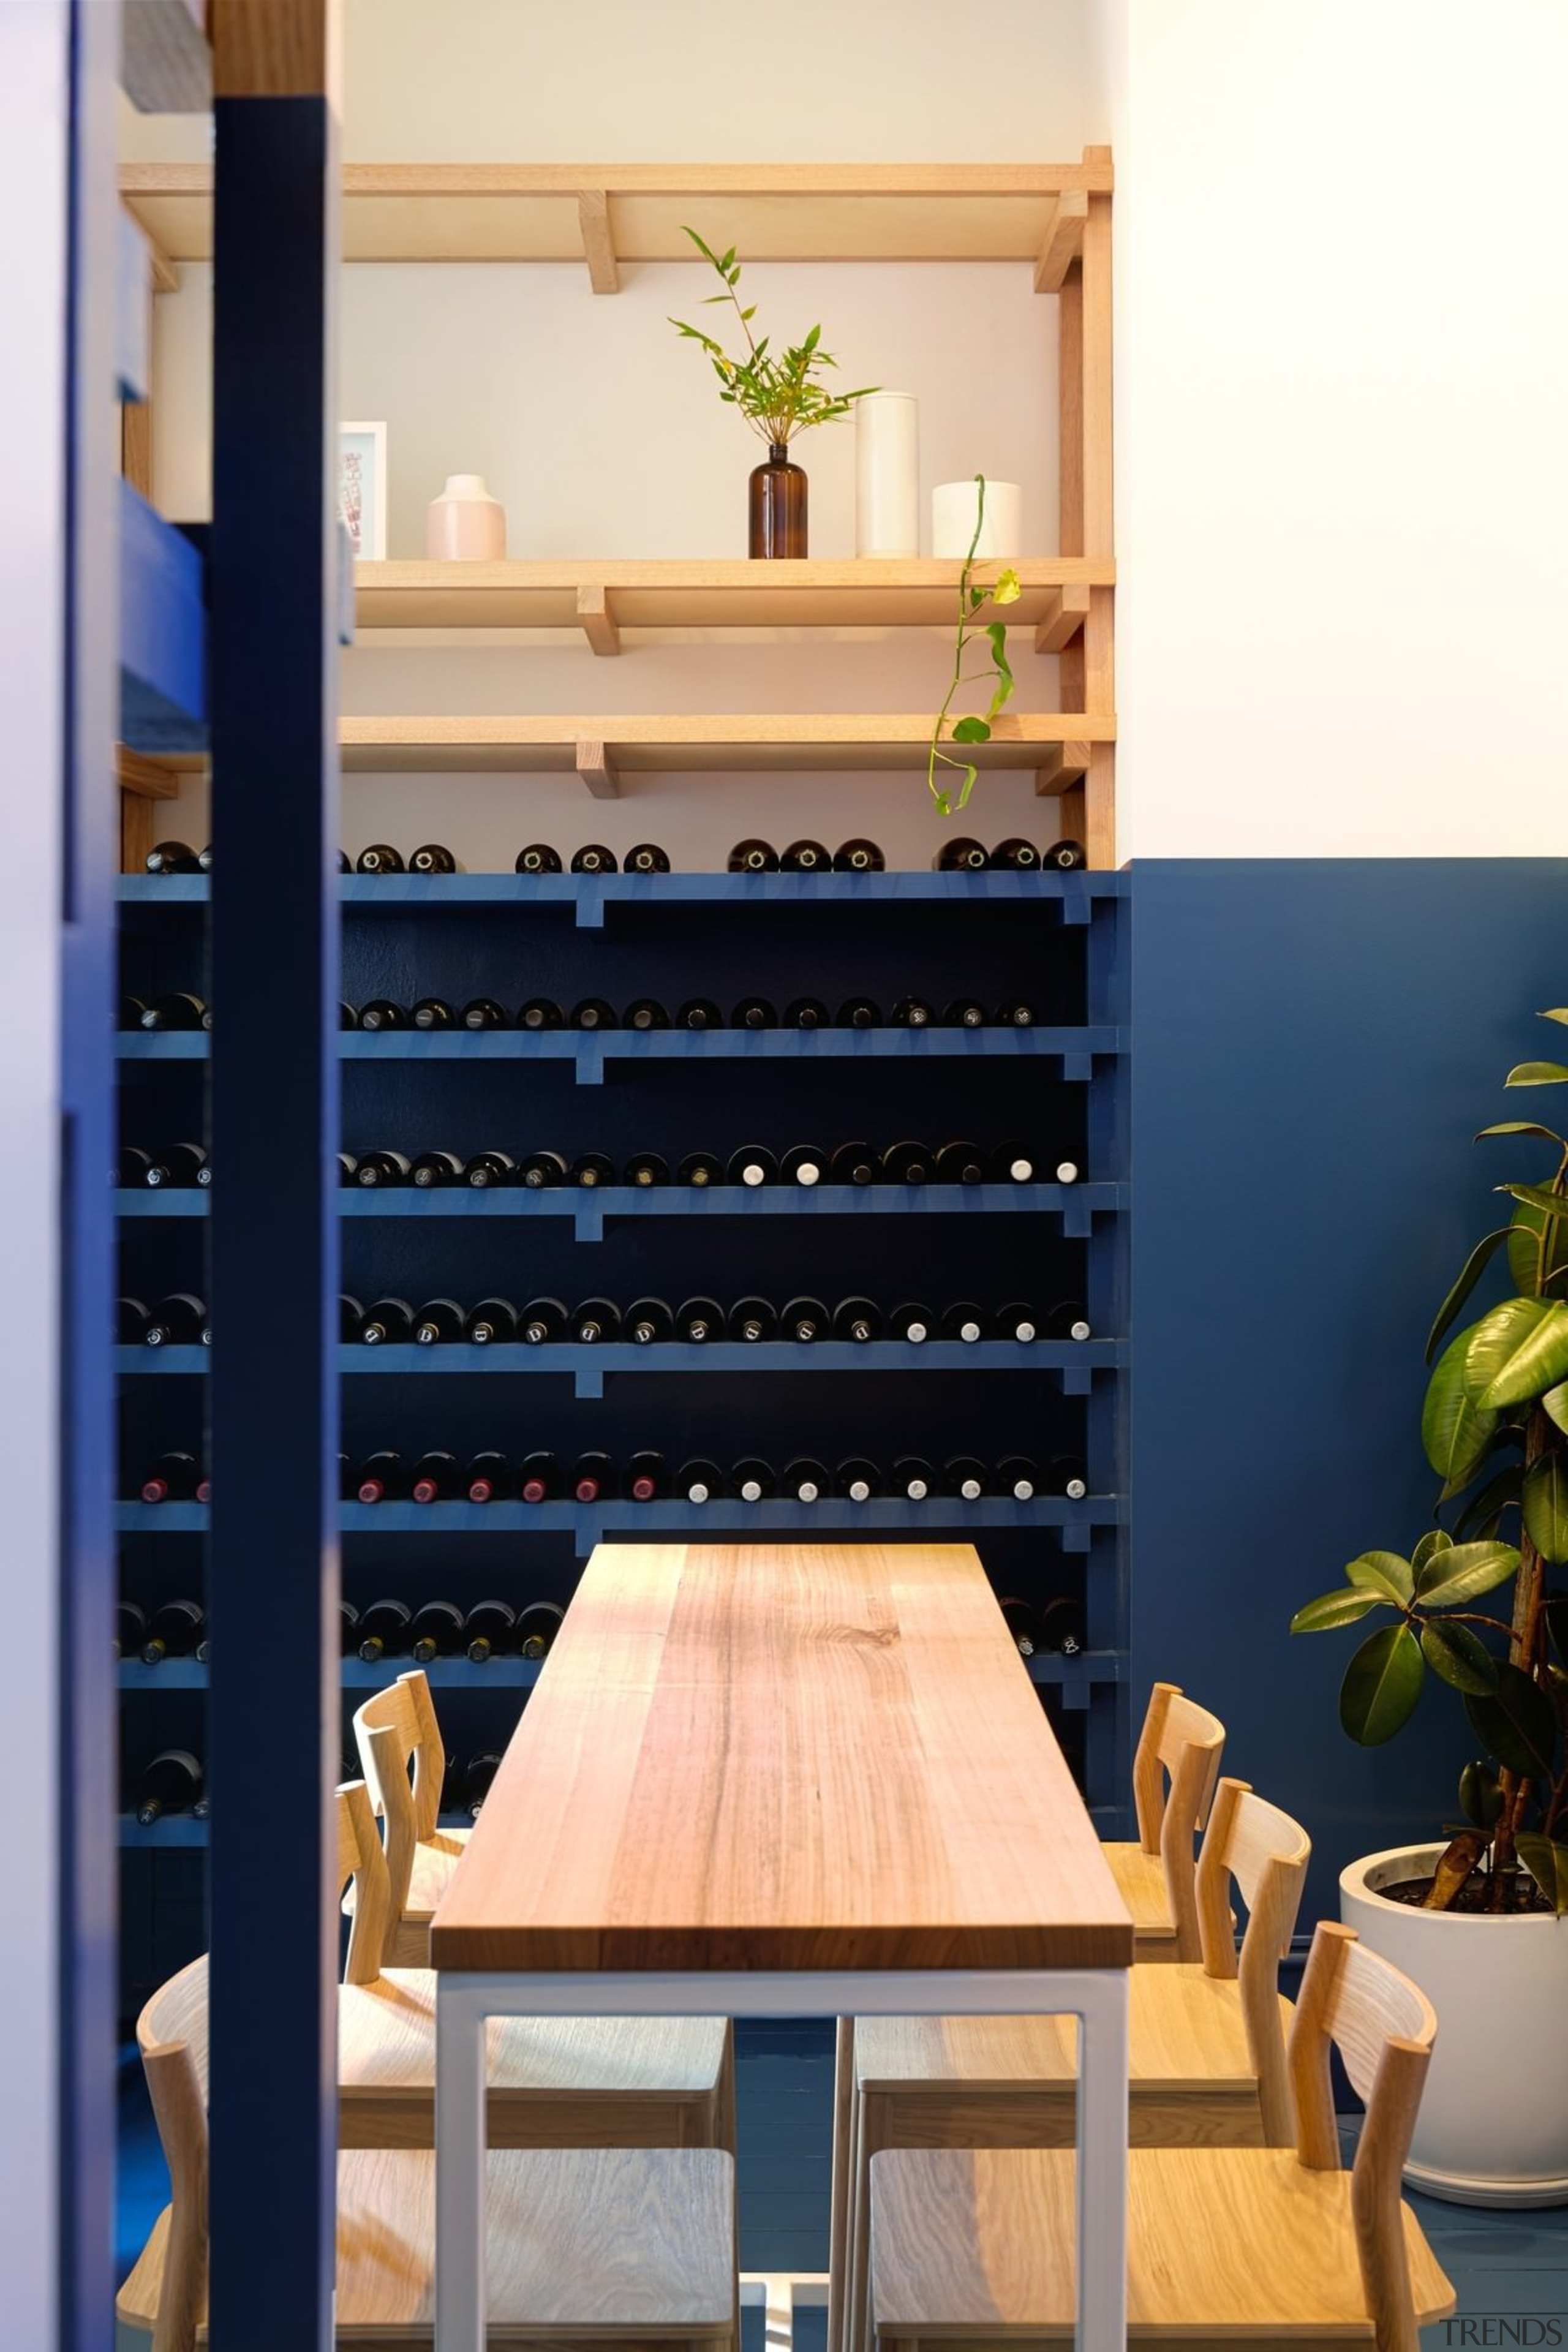 Architect: Studio GramPhotography by Jonathan VDK furniture, interior design, shelf, shelving, table, wood, blue